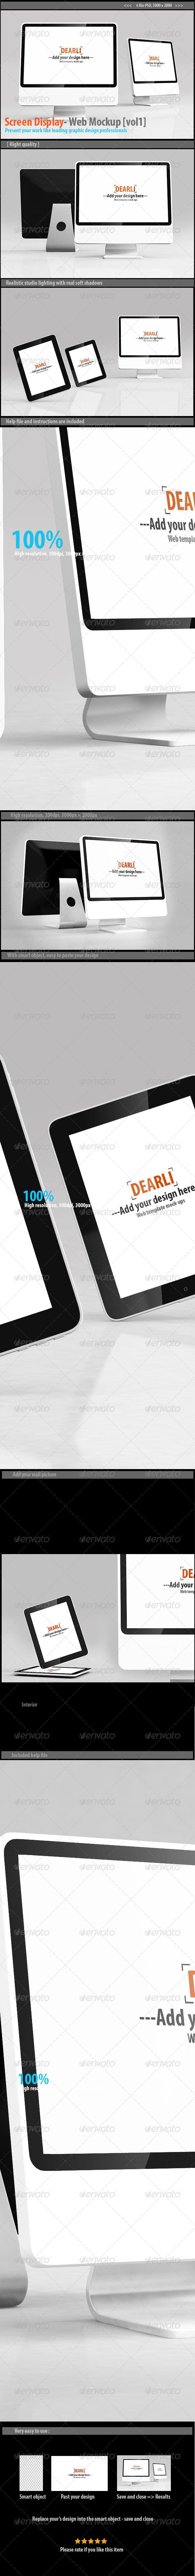 GraphicRiver Screen Display- Web Mockup [vol1] 8138584